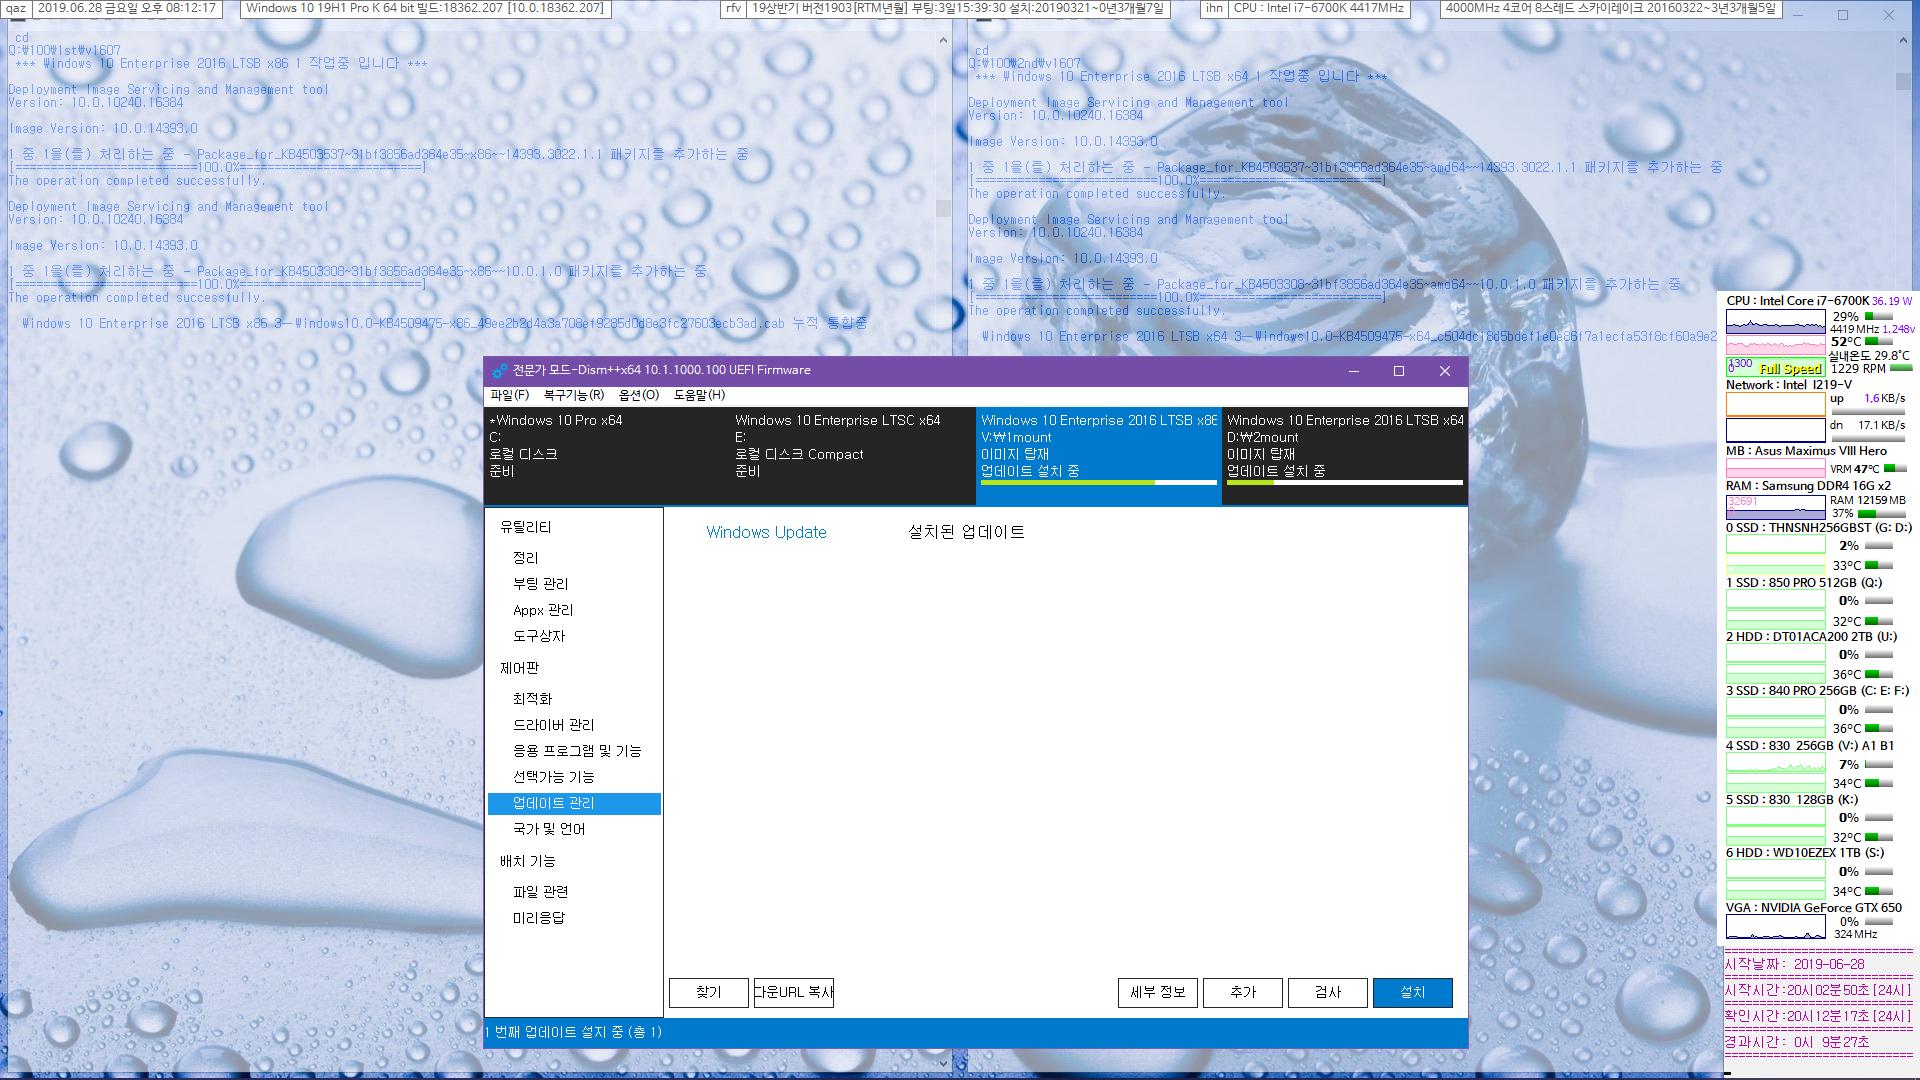 Windows 10 버전 1607 누적 업데이트 KB4509475 (OS 빌드 14393.3056) [2019-06-27 일자] 수시 업데이트 나왔네요 - 2016 LTSB 통합중 입니다 [2번째] - 작업후 백업해놓은 하드 디스크가 이상해서 파일이 손상 2019-06-28_201217.png